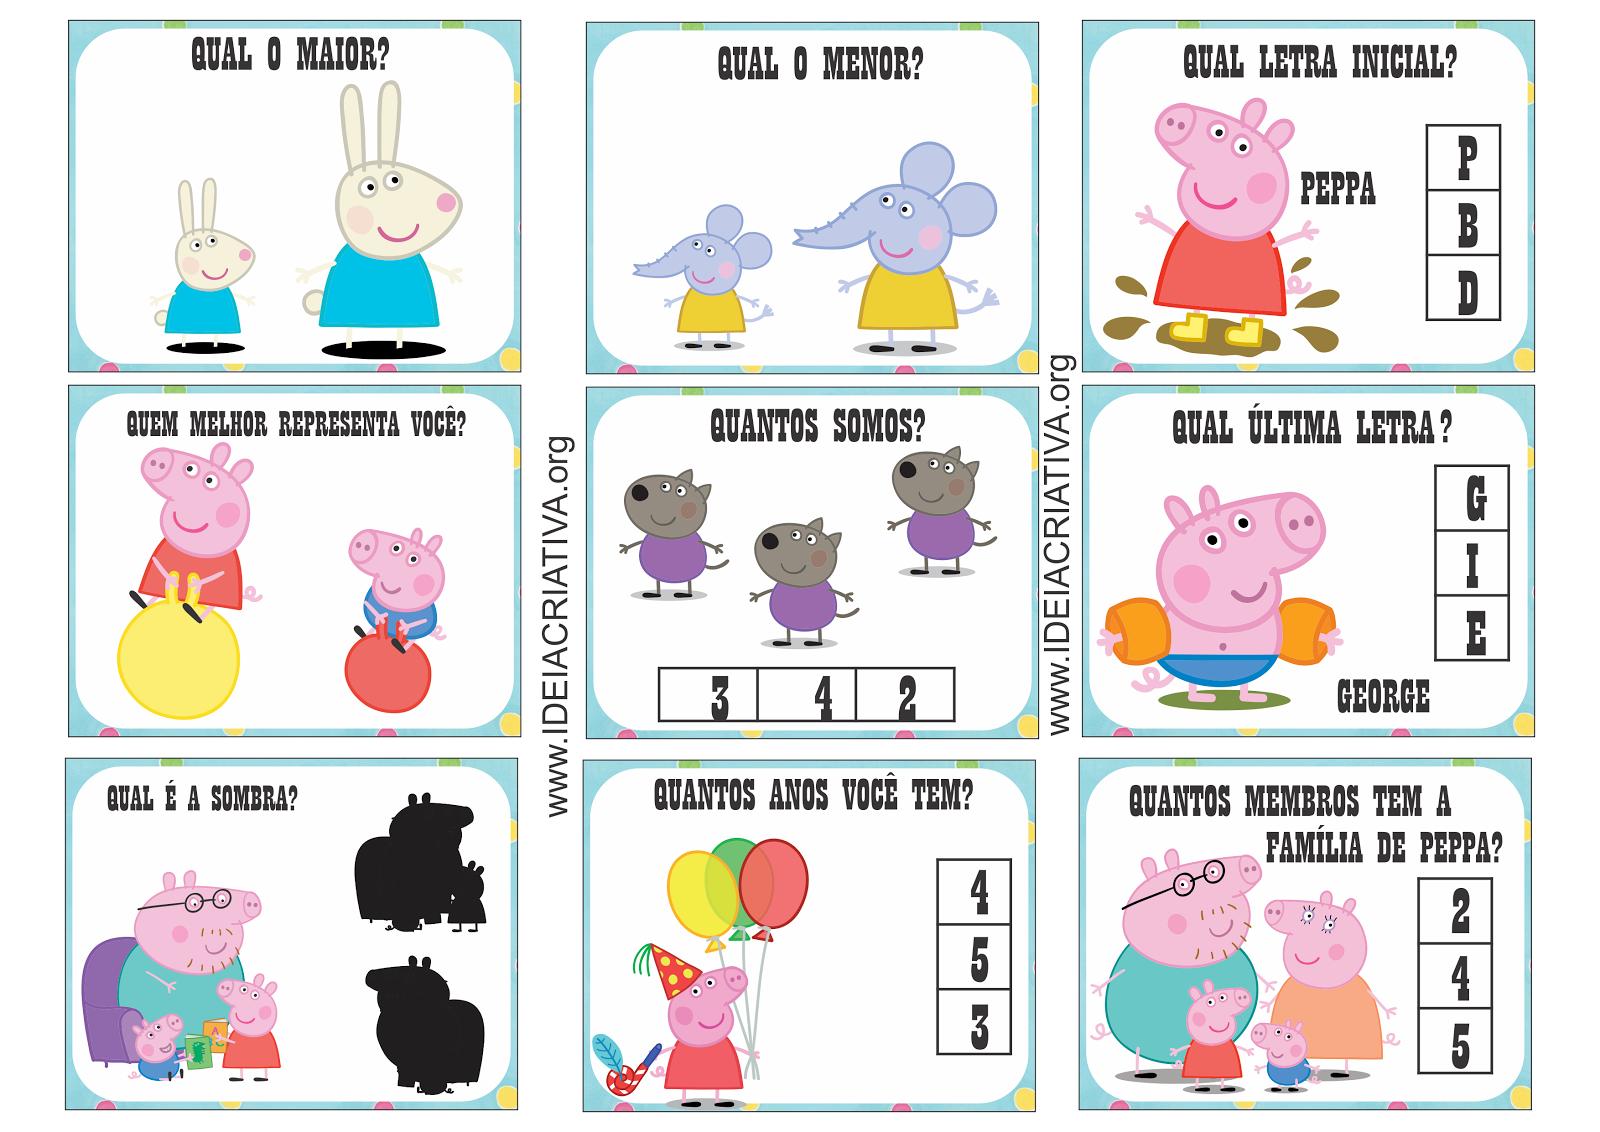 Cart Es Sondagem Peppa Pig Sala De Recursos Multifuncional Aee  -> Sala De Aee Decoracao